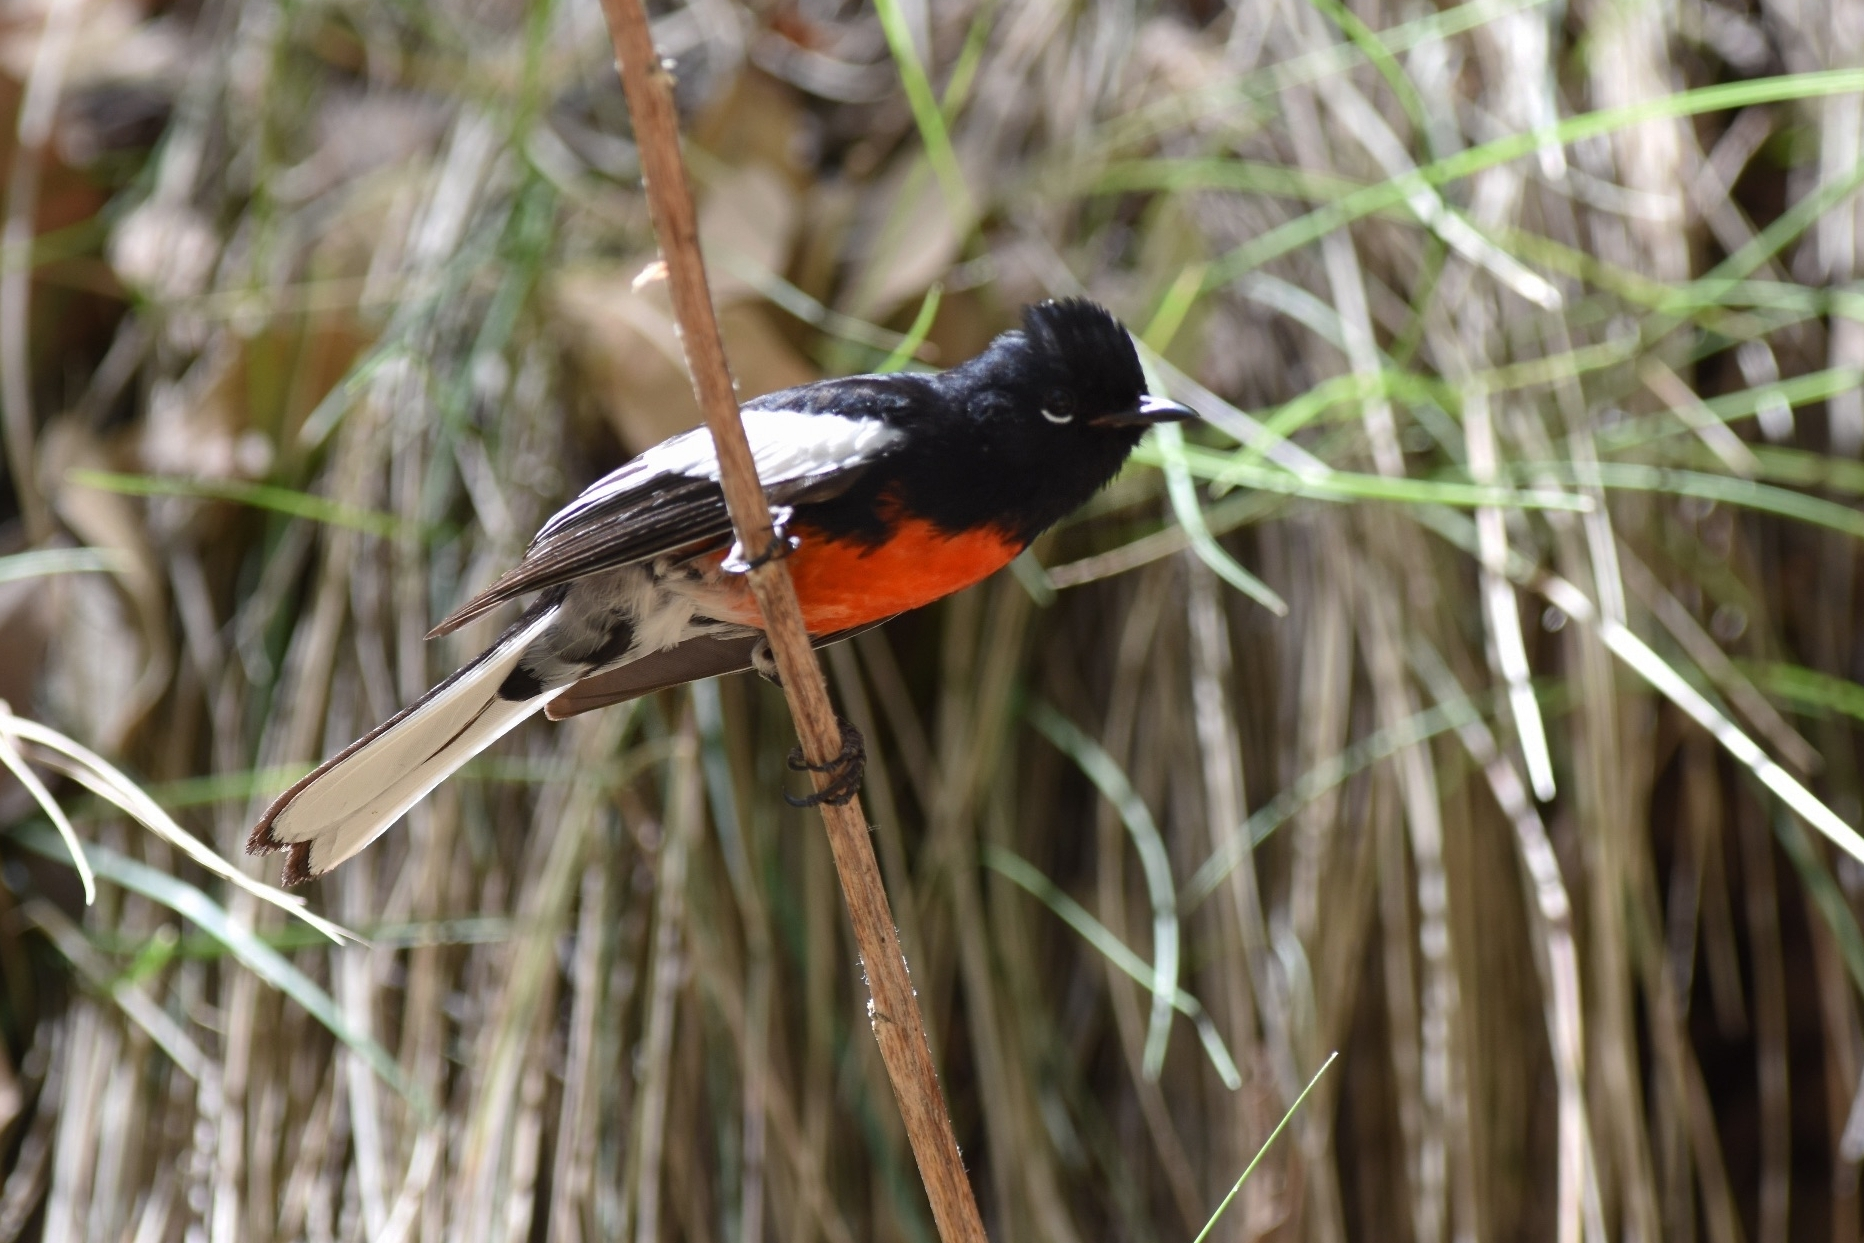 Arizona - Condors, Hummingbirds & the Second Spring